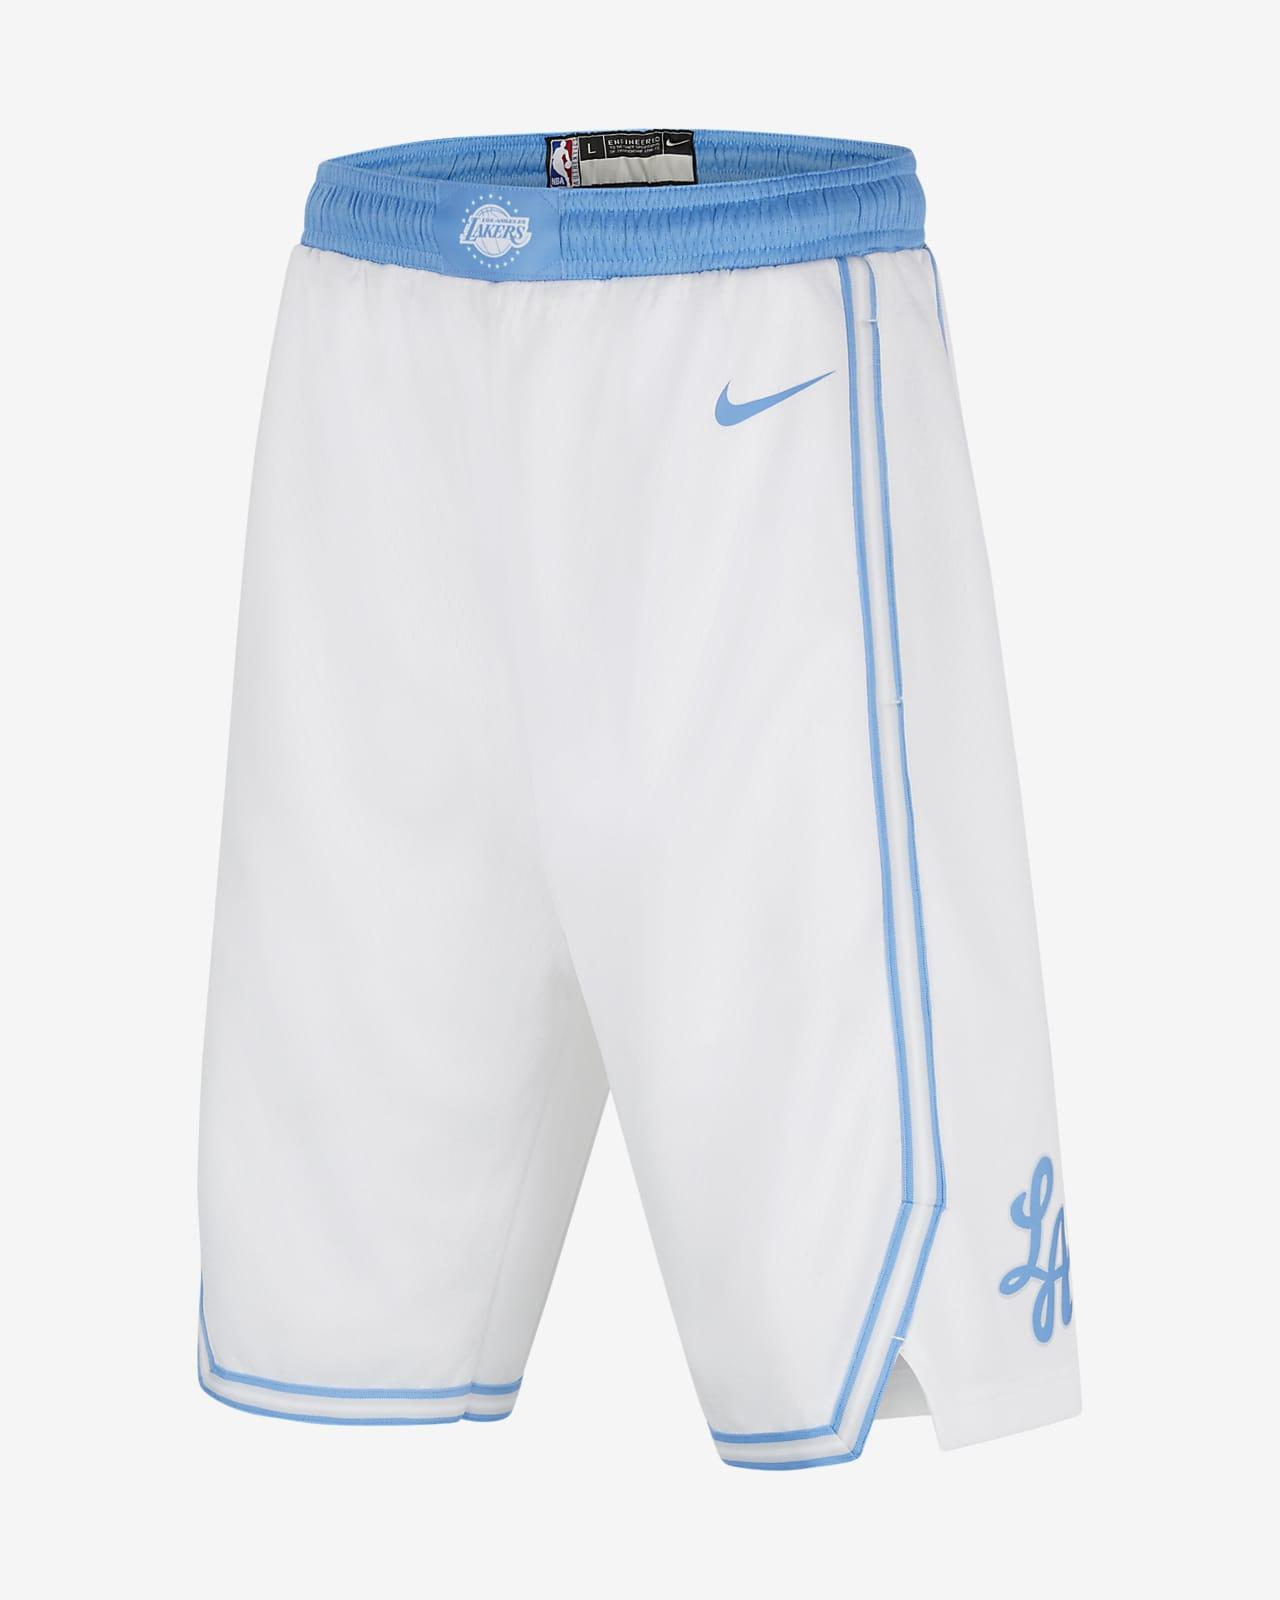 Los Angeles Lakers City Edition Older Kids' Nike NBA Swingman Shorts